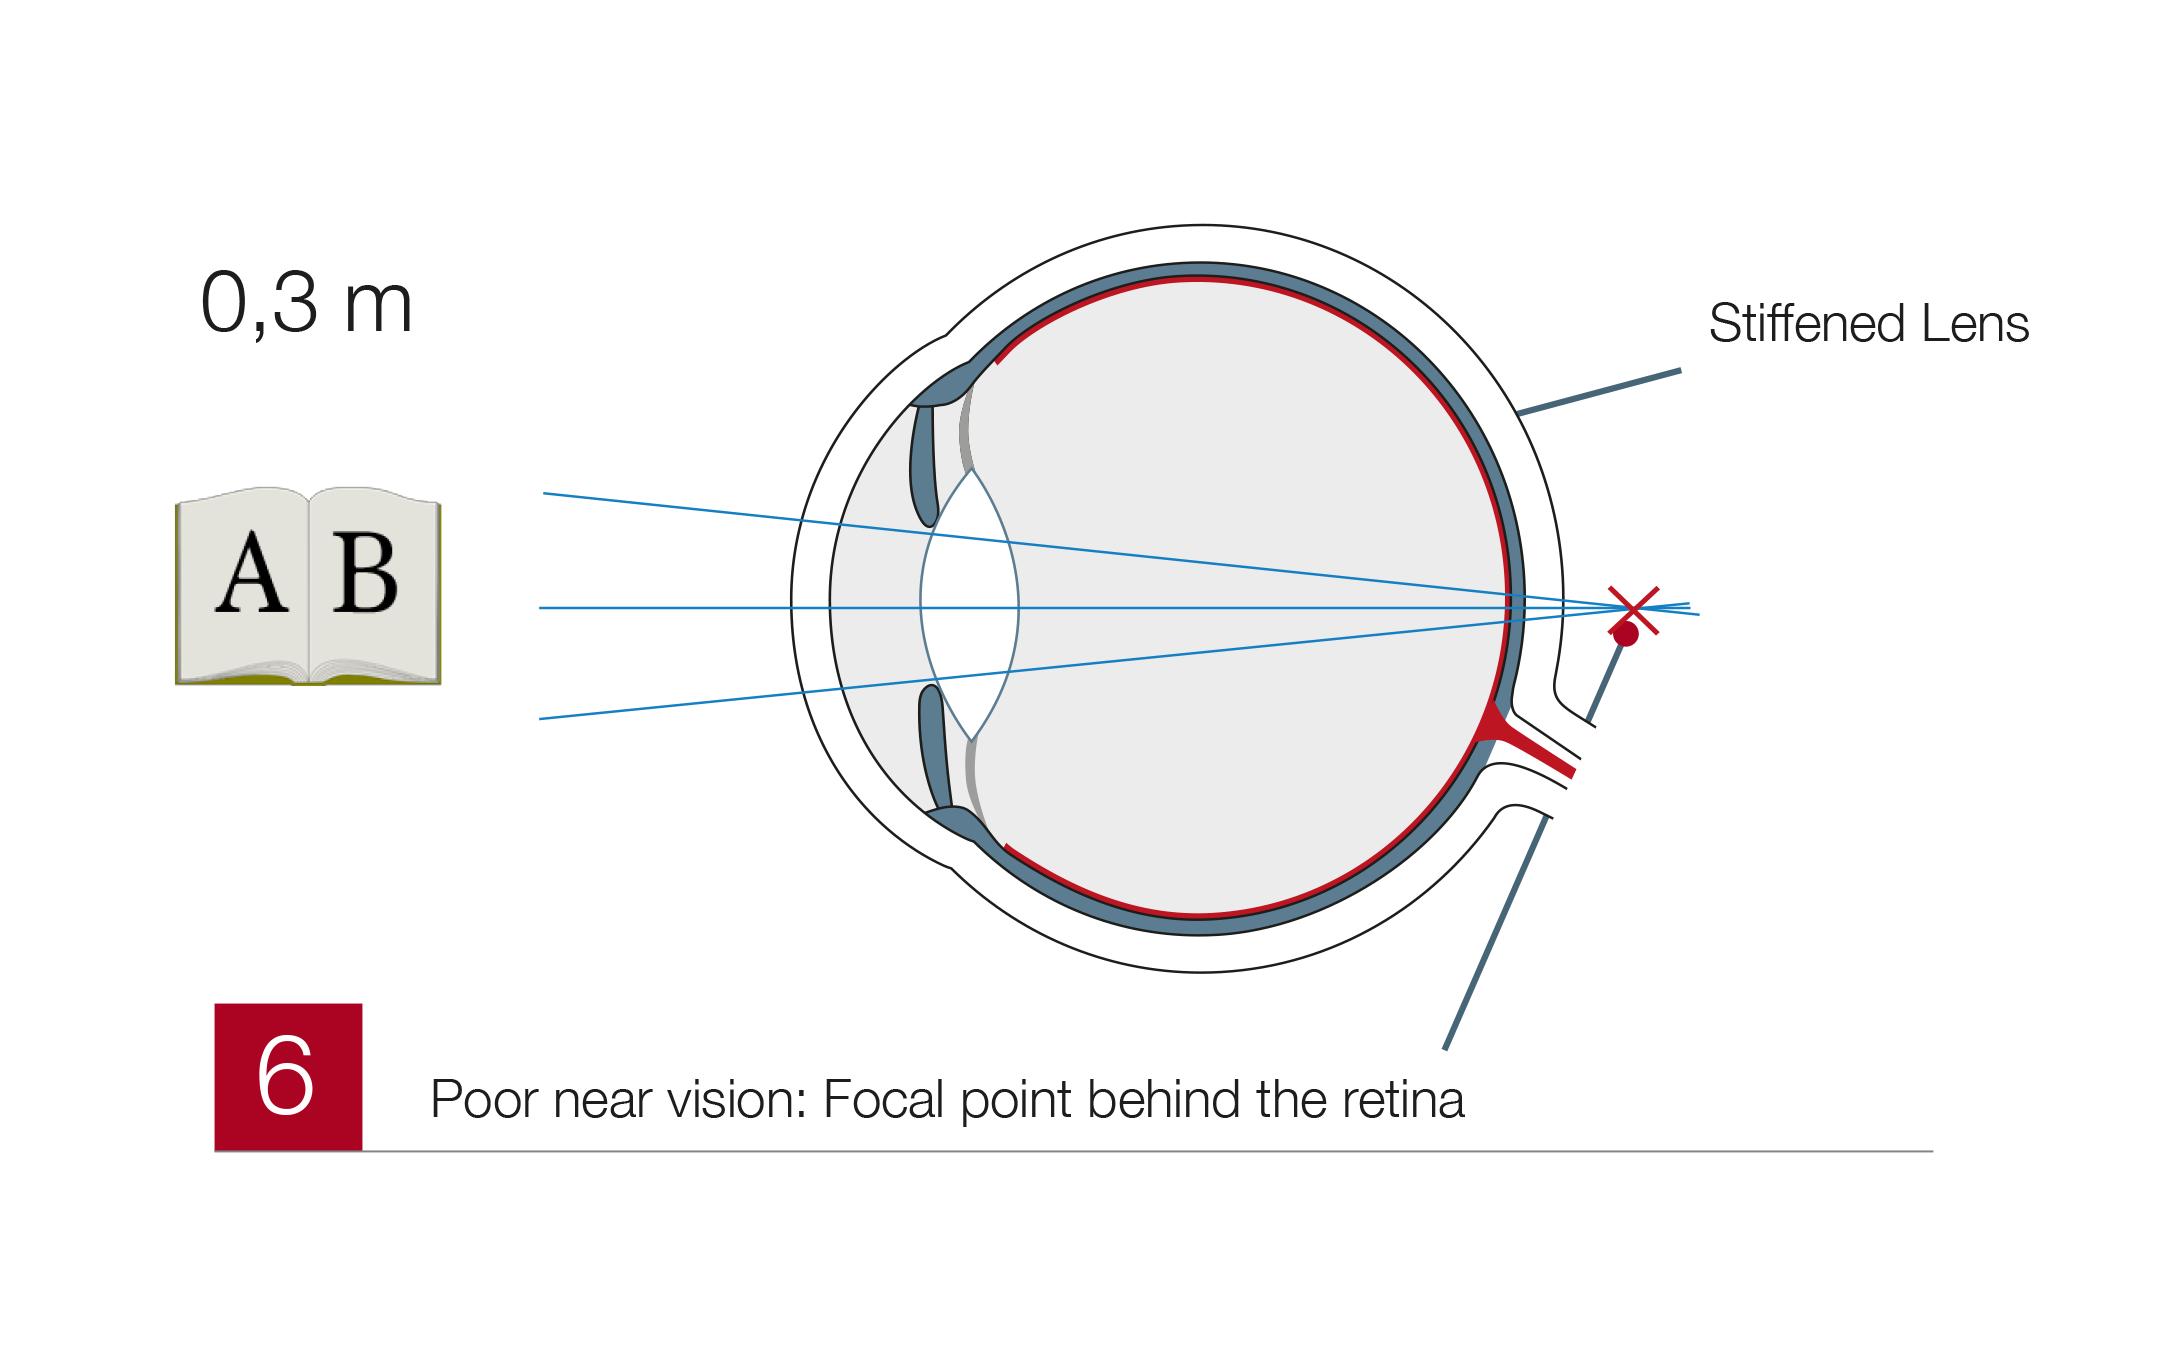 Presbyopia6